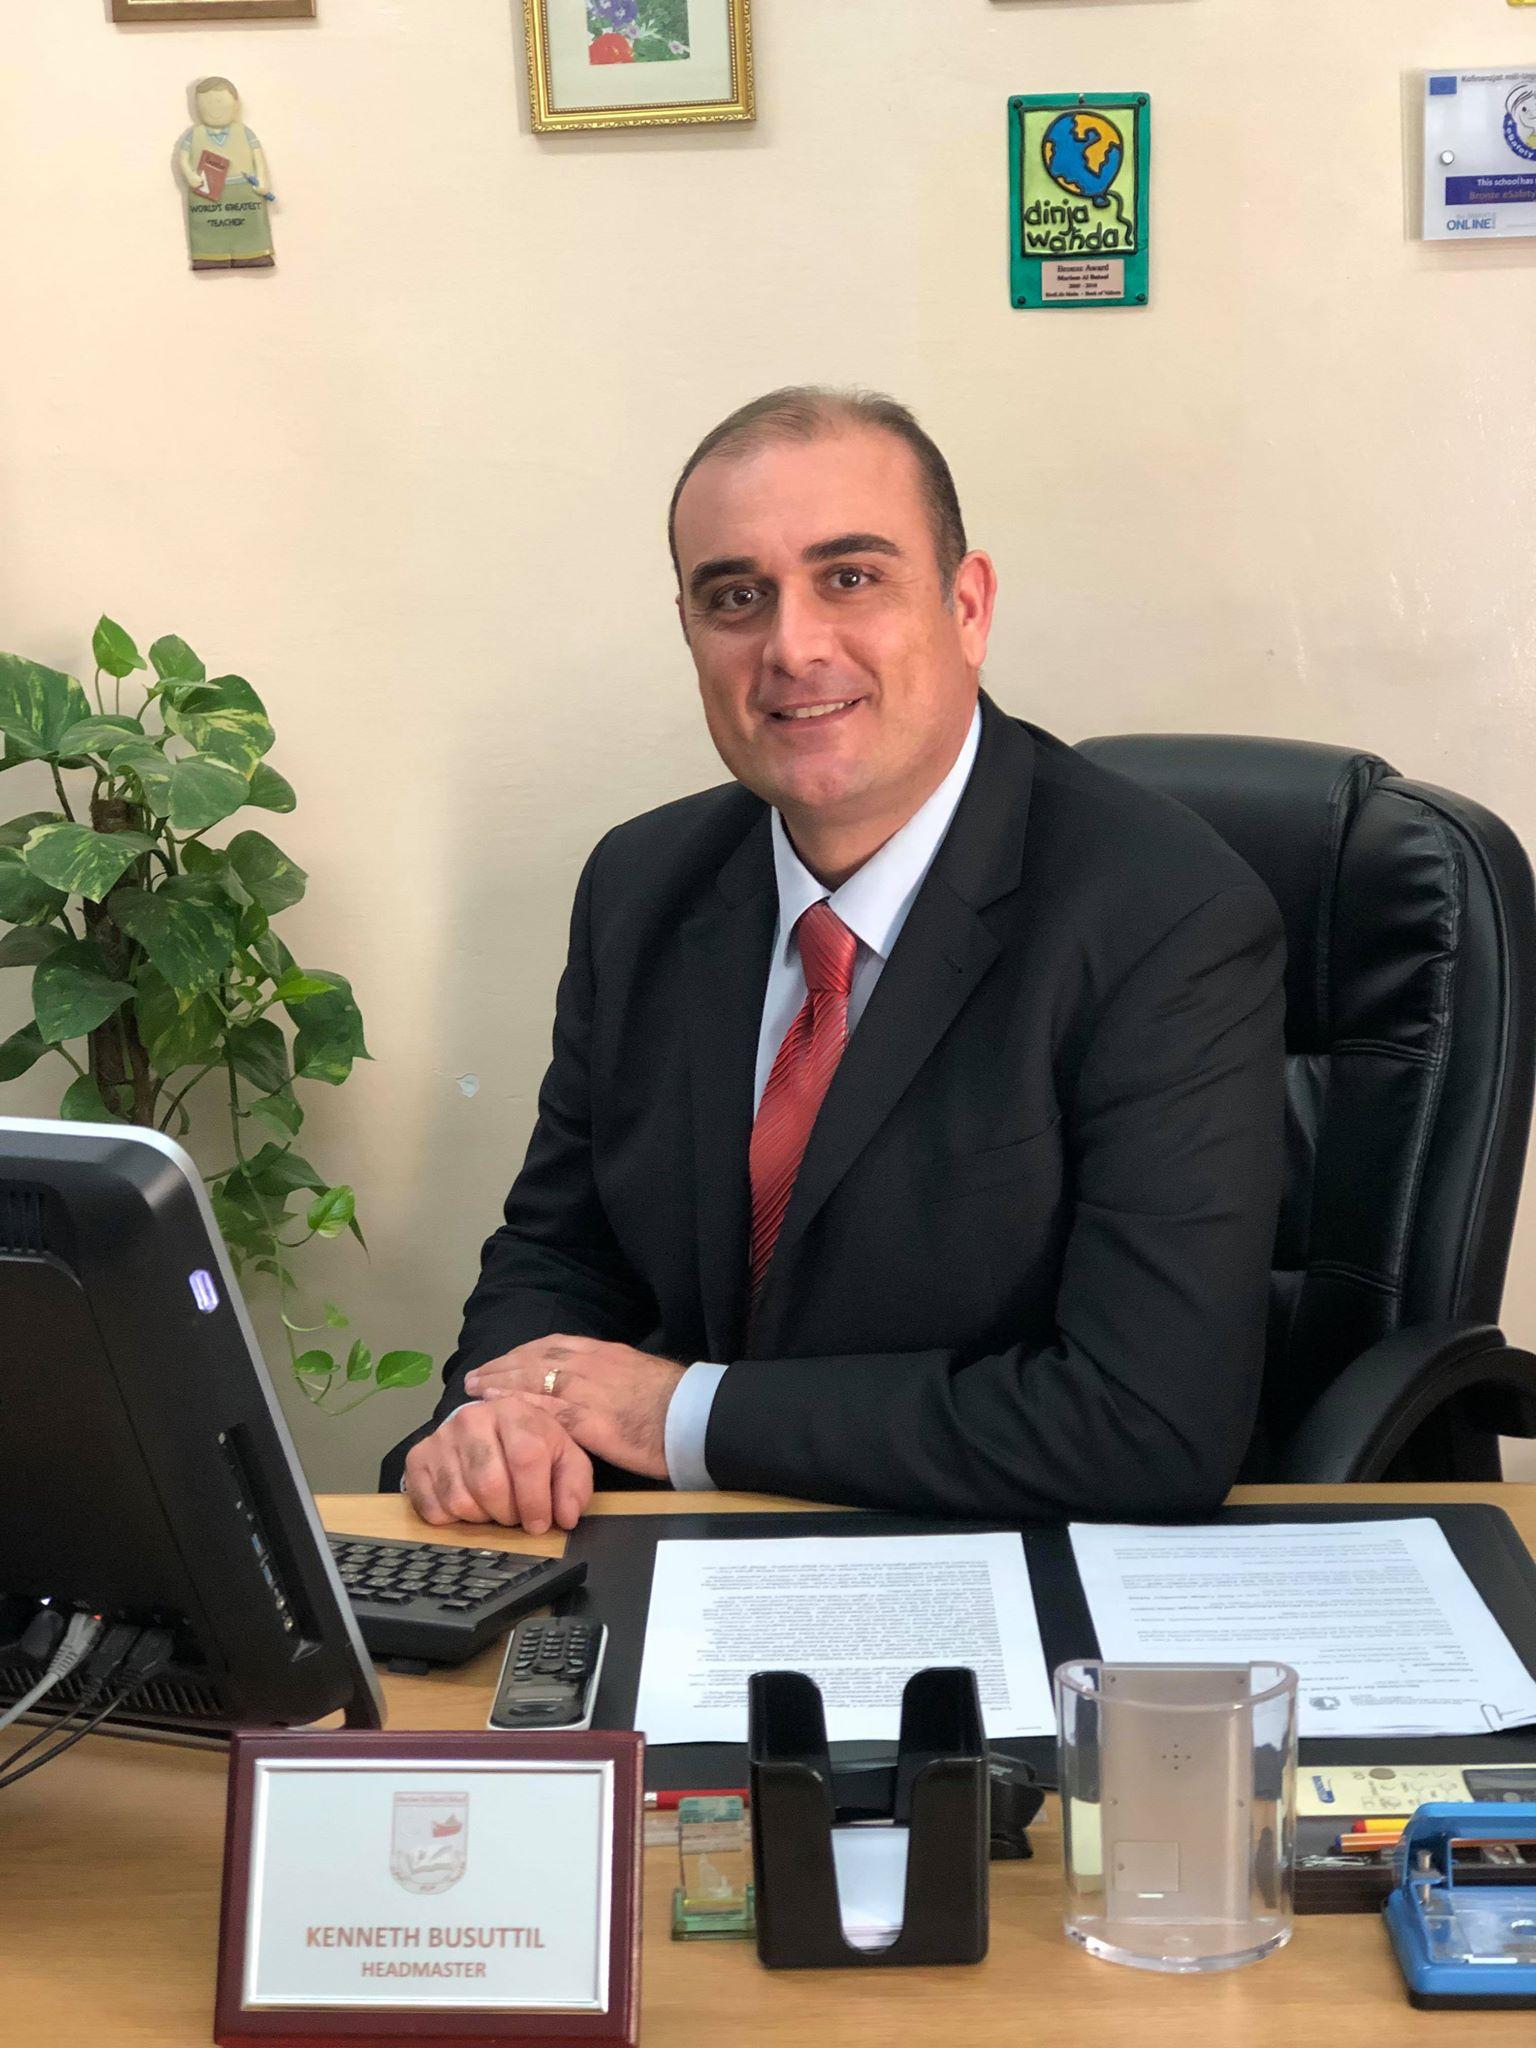 Mr. Kenneth Busuttil